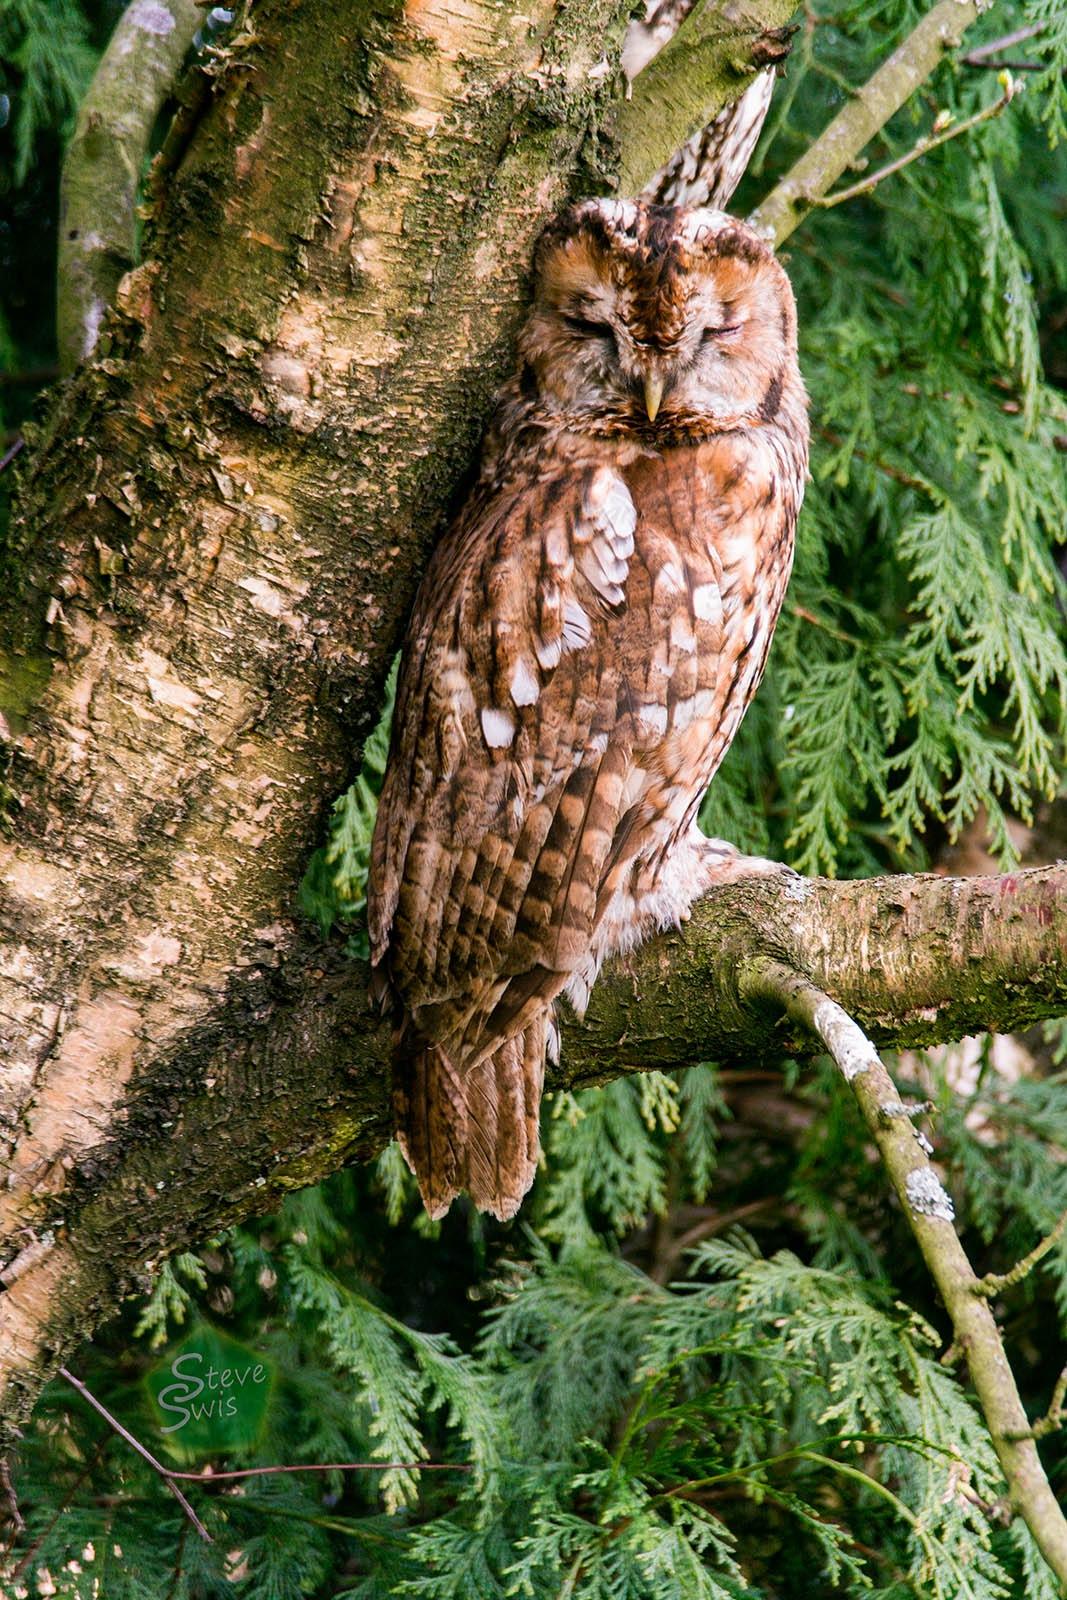 Tawny owl asleep by Steve Swis